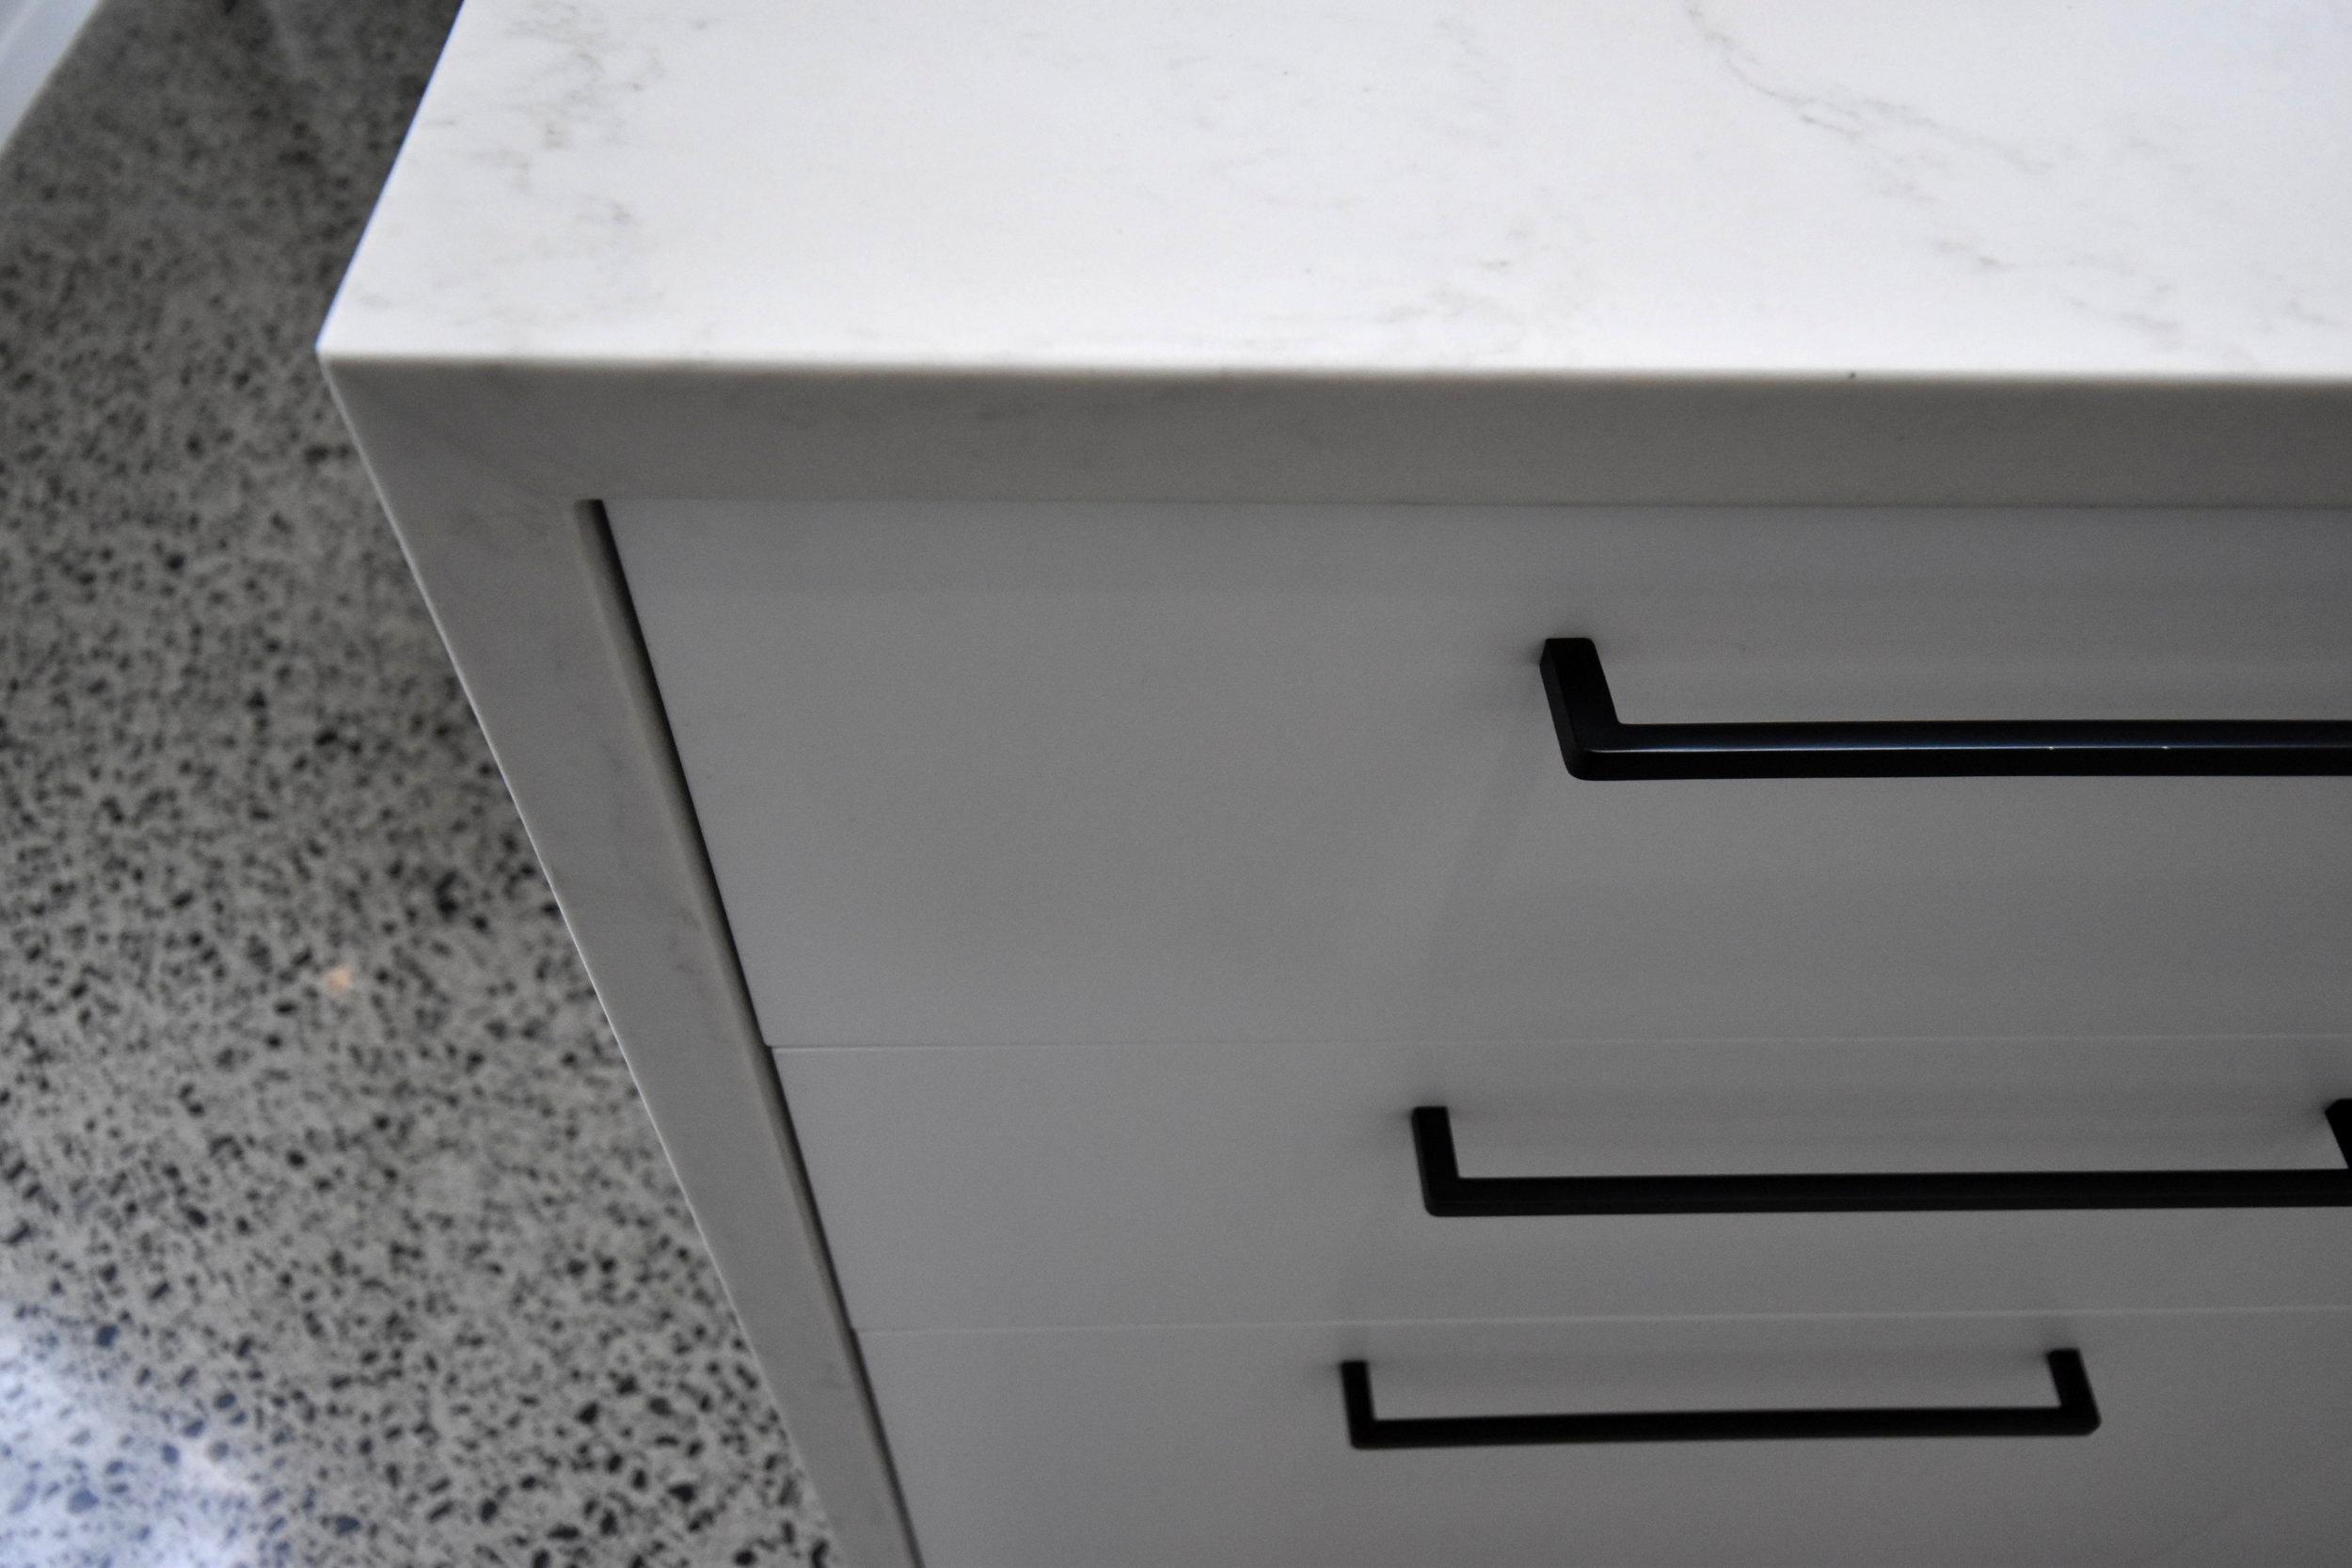 Matte white kitchen cabinetry with matte black D handles.